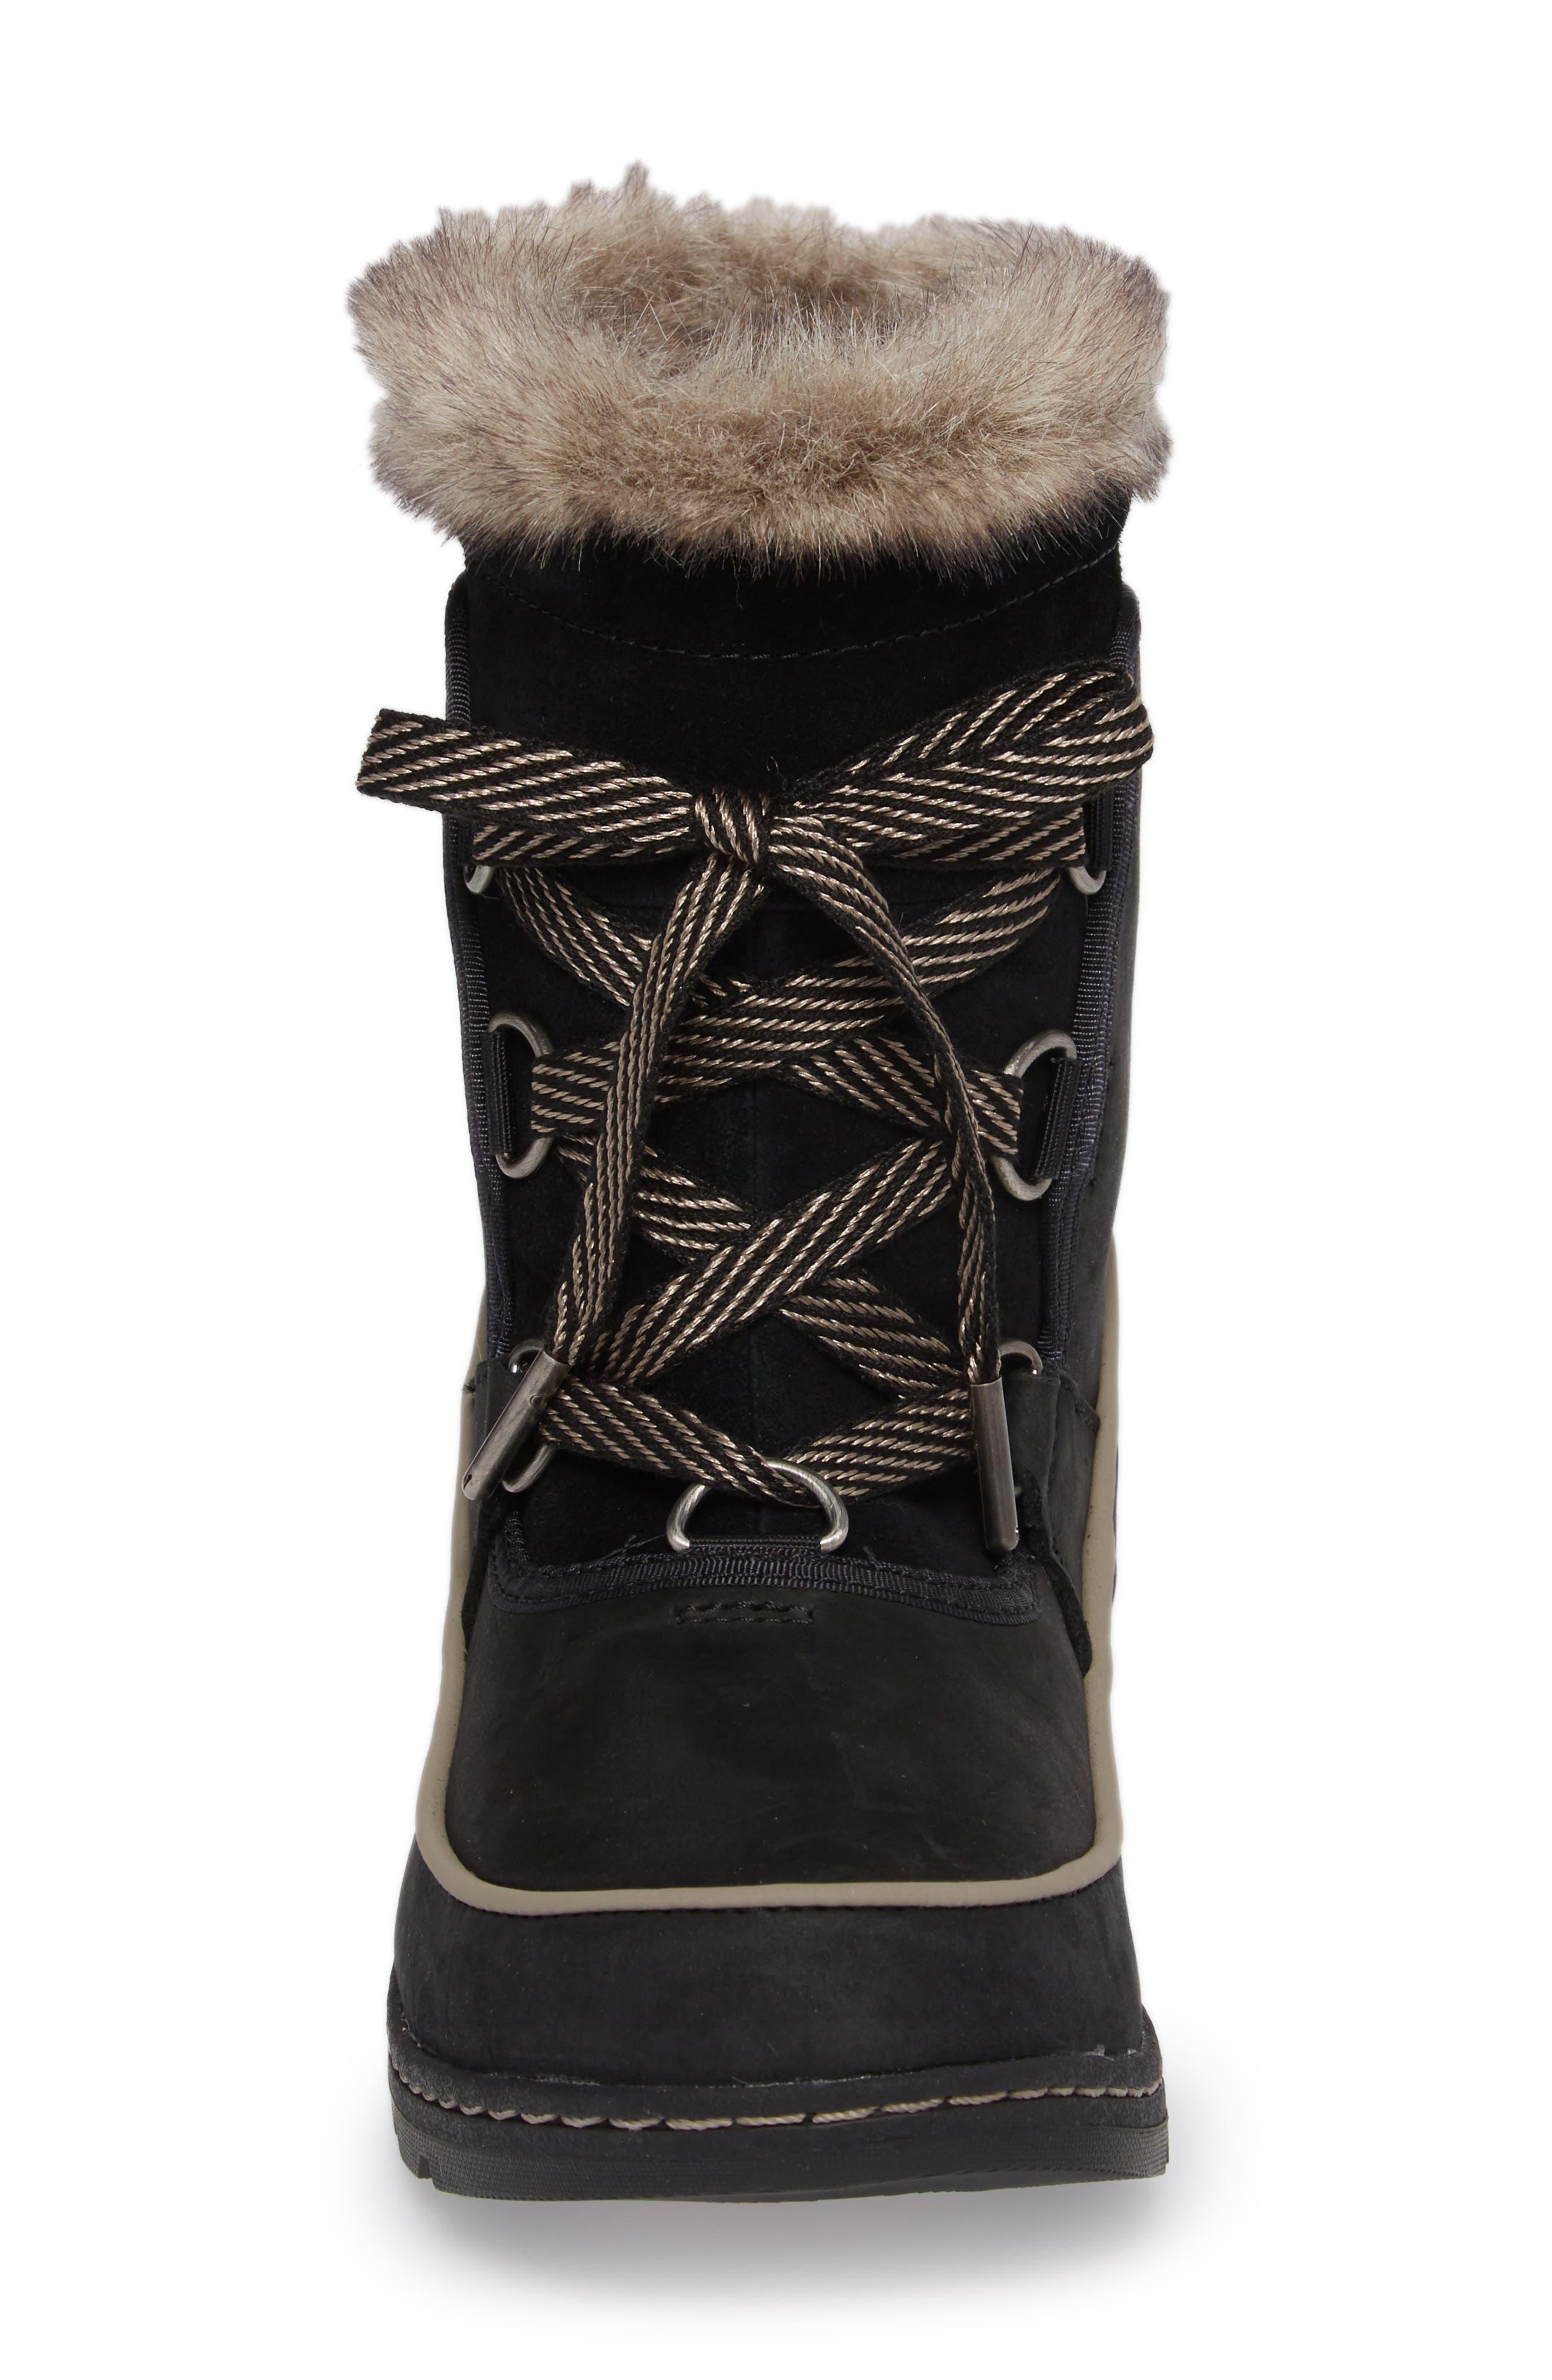 Alternate Image 4  - SOREL Tivoli II Insulated Winter Boot with Faux Fur Trim (Women)